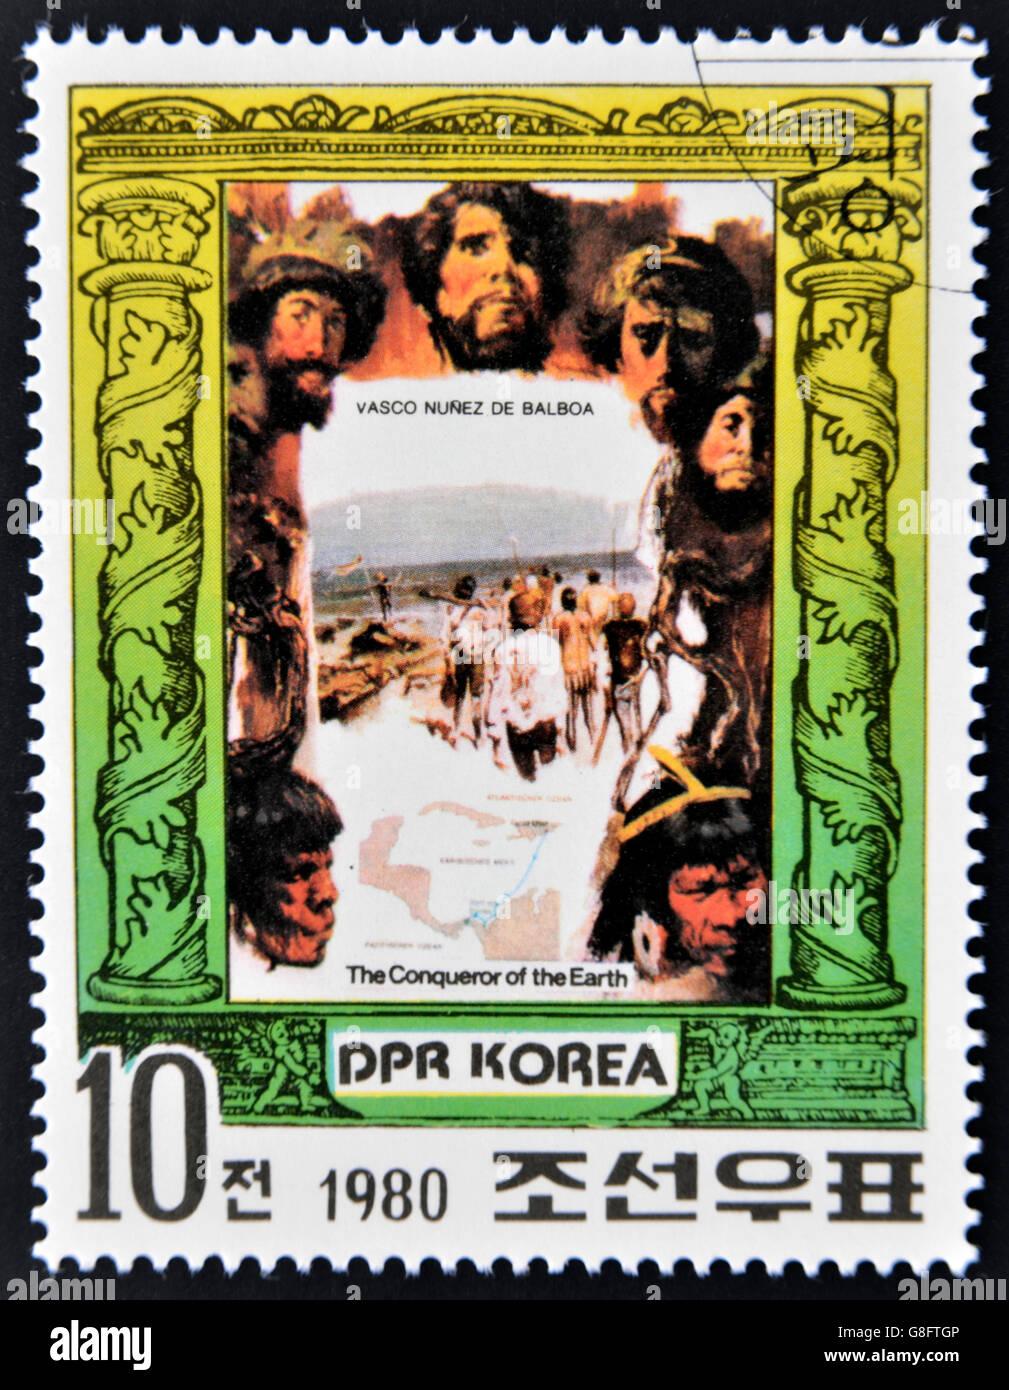 DEMOCRATIC PEOPLES REPUBLIC DPR Of KOREA